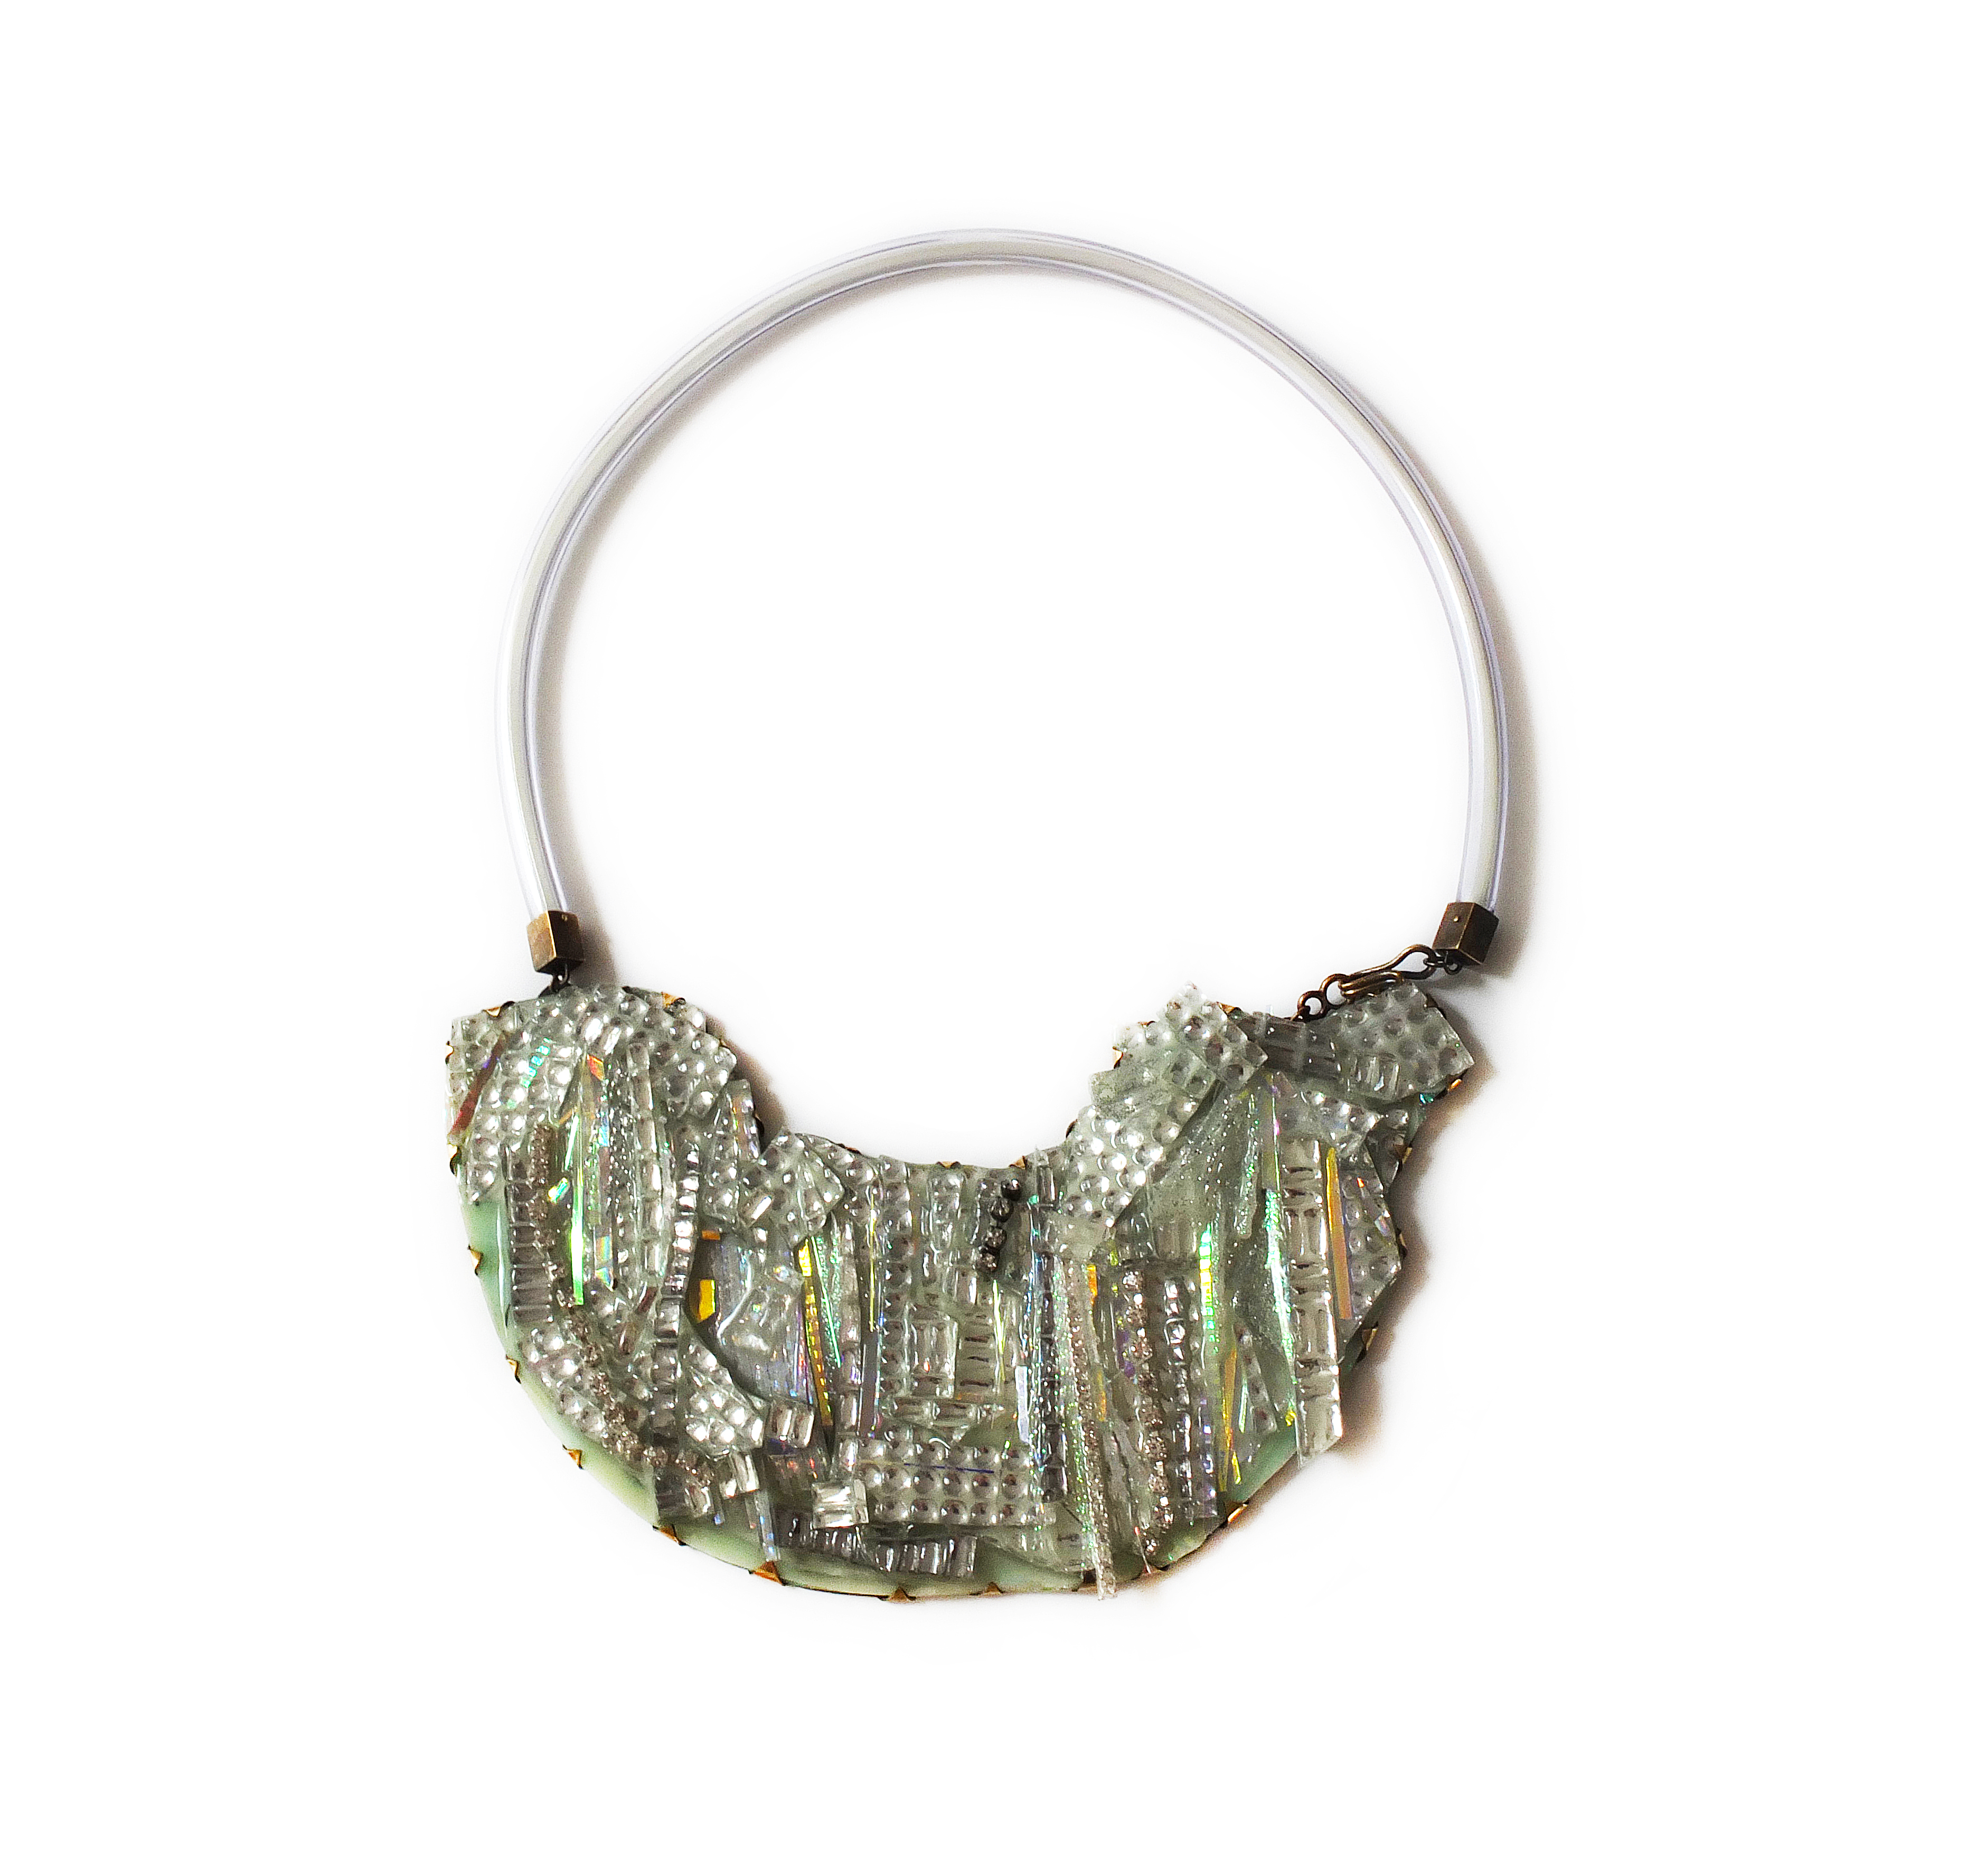 Nikki Couppee, Legends Glow Gems Necklace, Plexiglass, brass, sterling silver, fine silver